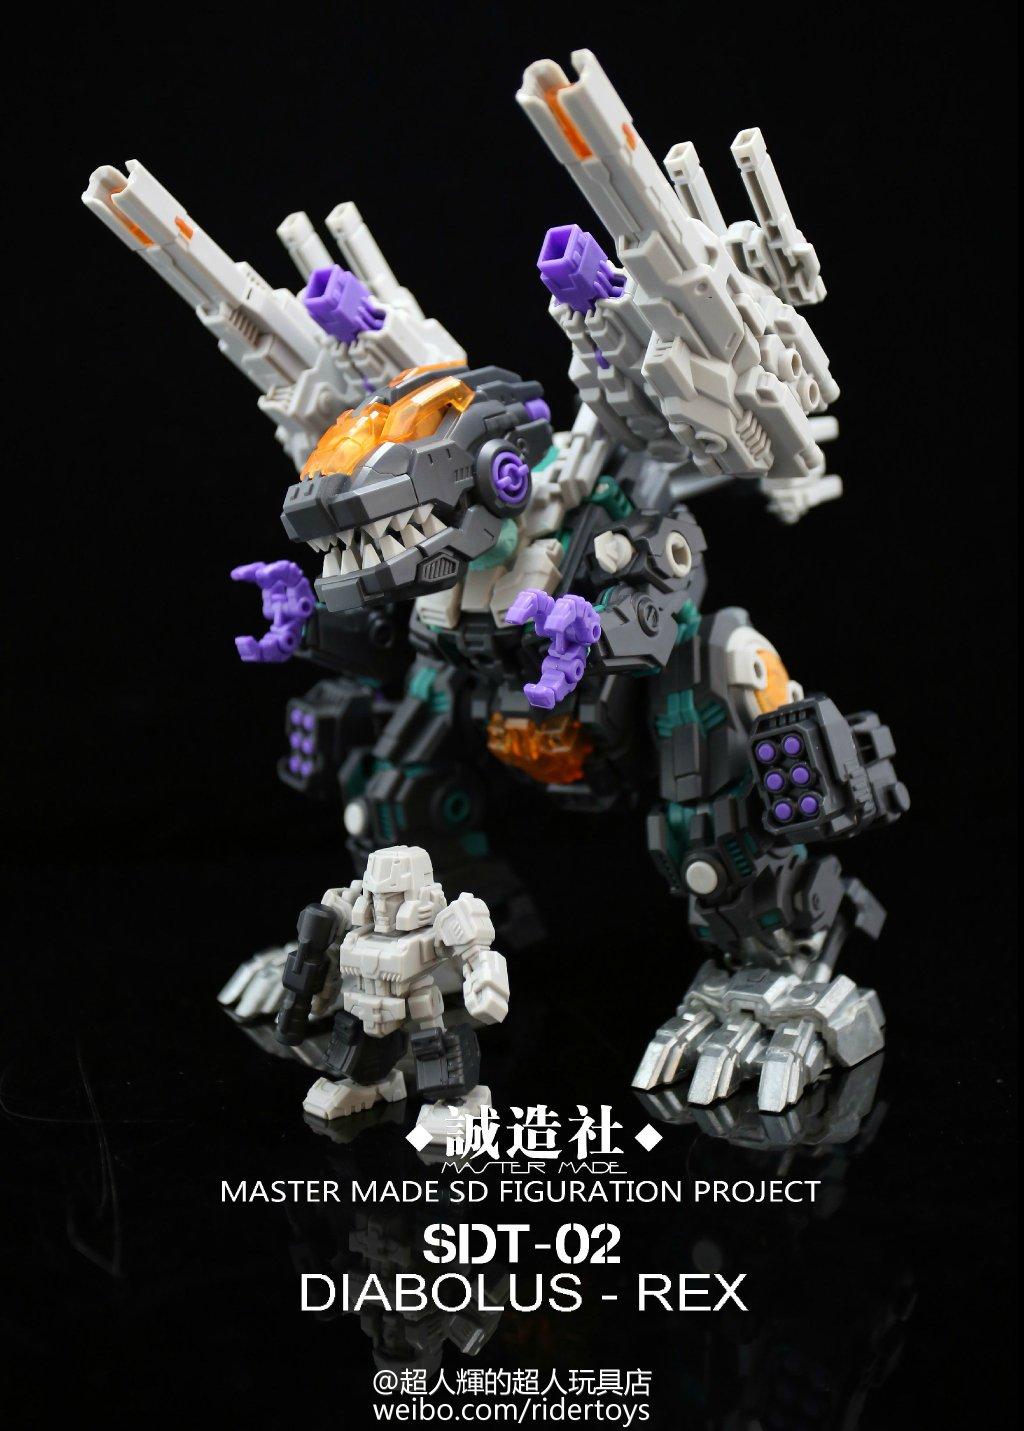 Produit Tiers - Figurine miniature déformé (transformable) - Par: Hero Hobby + MiniPower + Master Made Diabolus-Rex-01